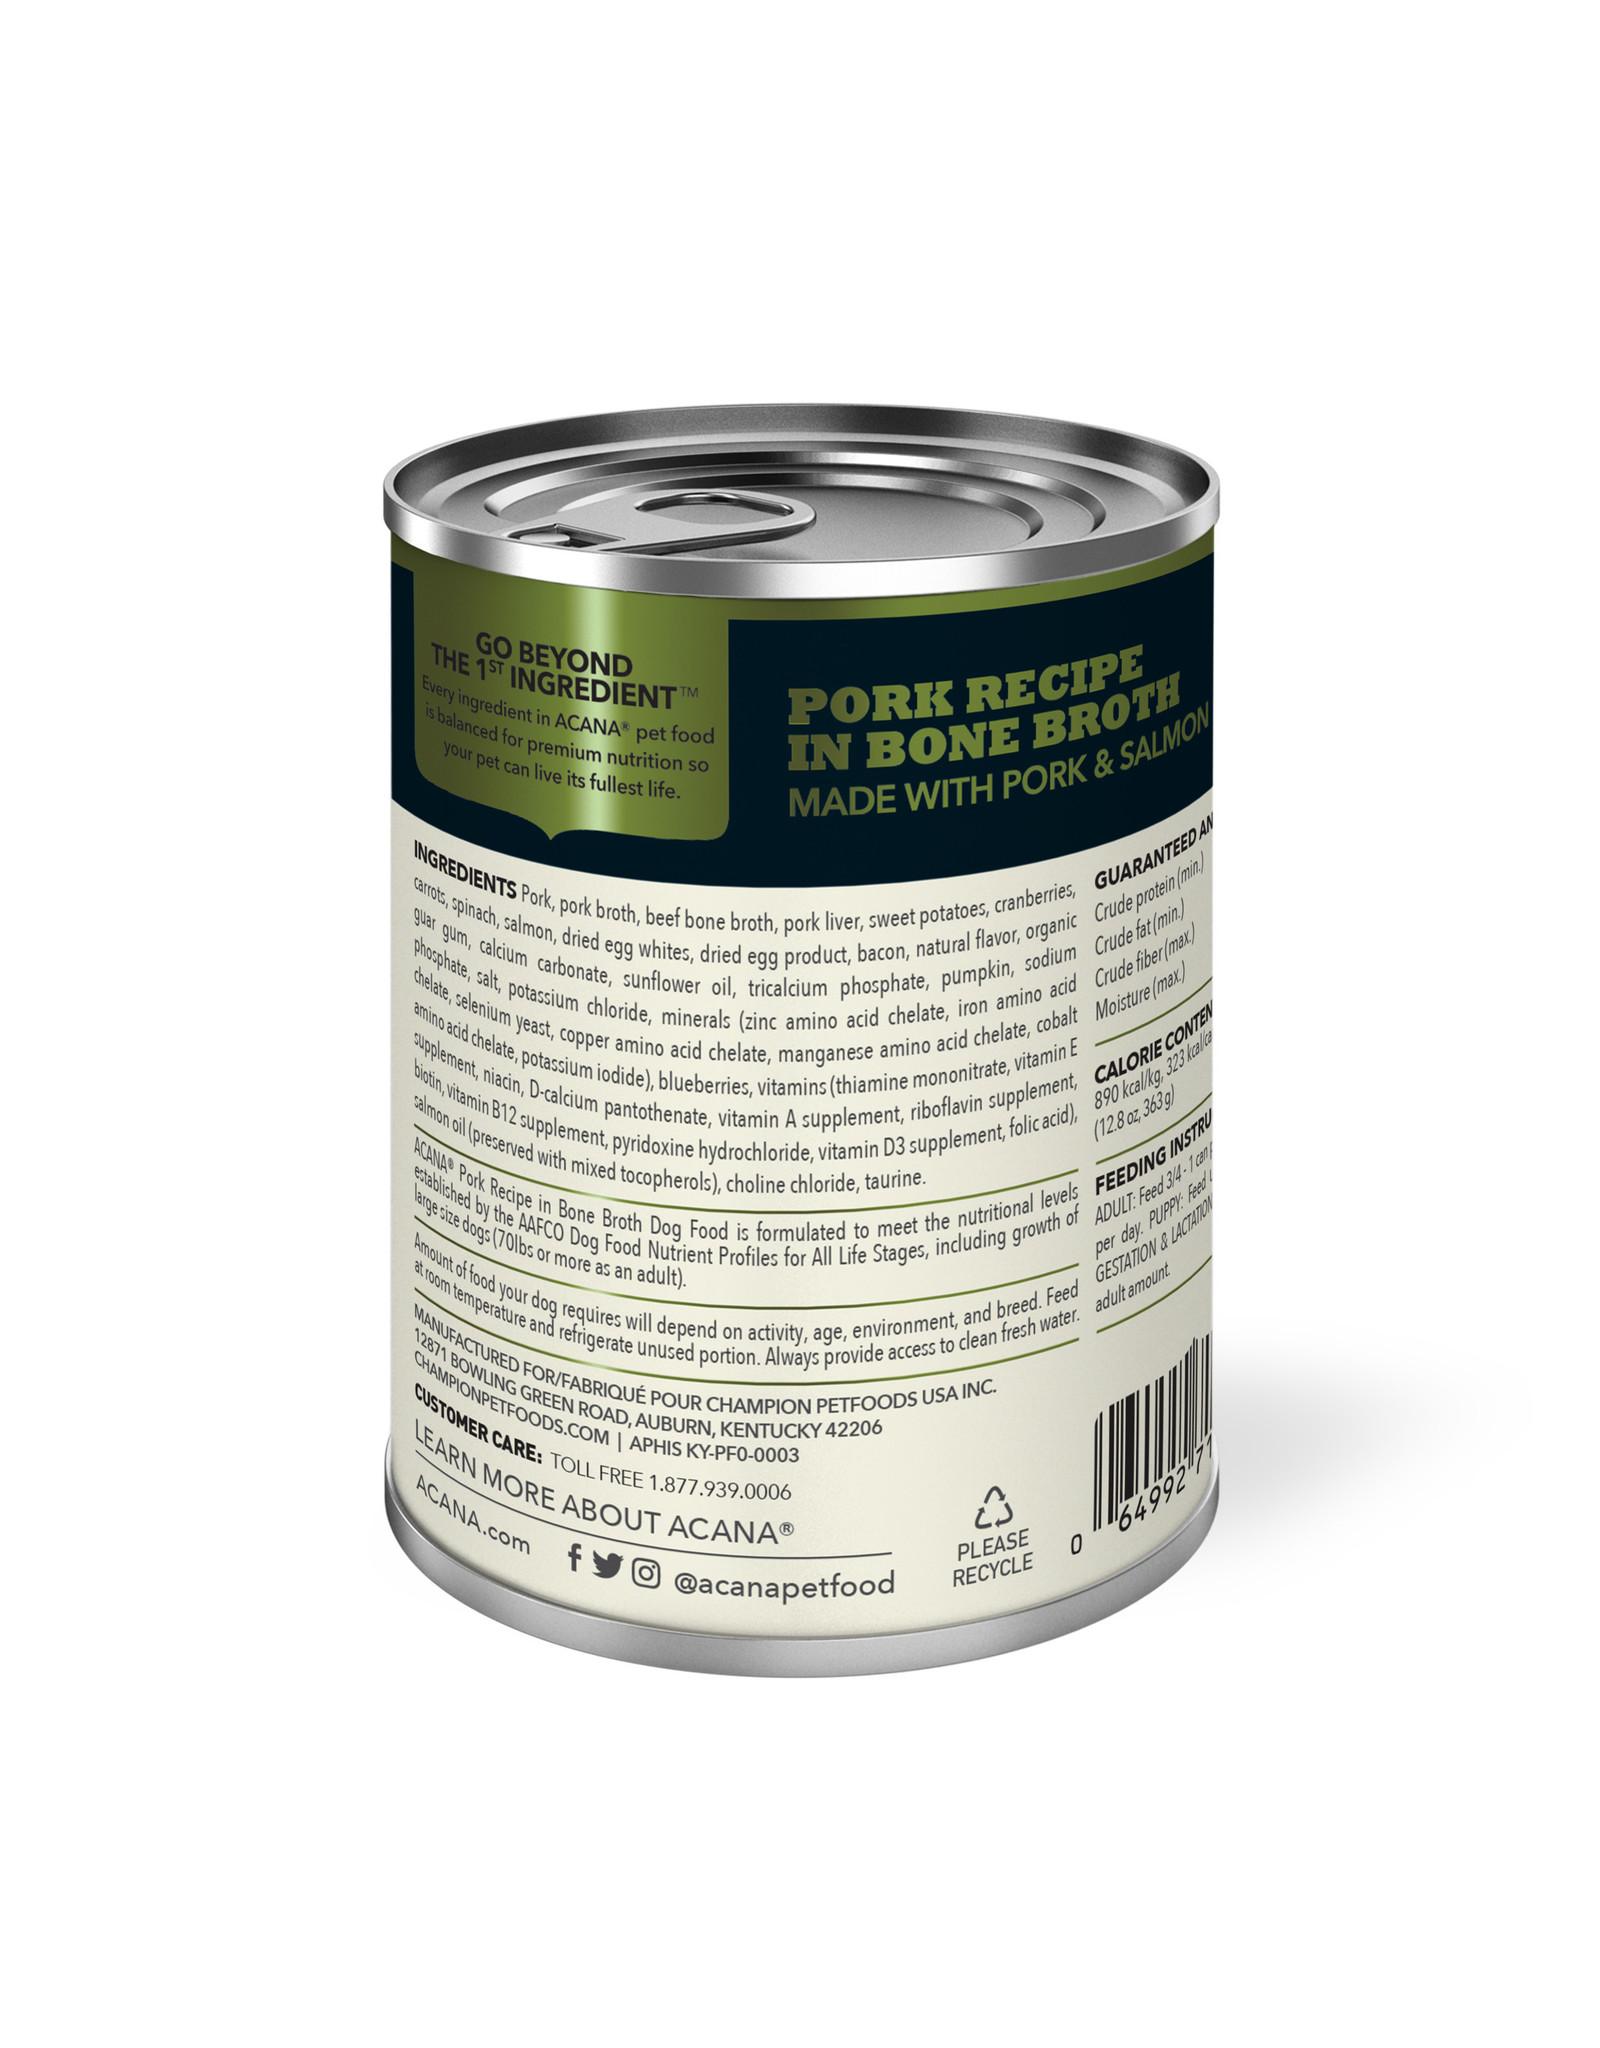 ACANA ACANA Wet Food Pork Recipe in Bone Broth 363g